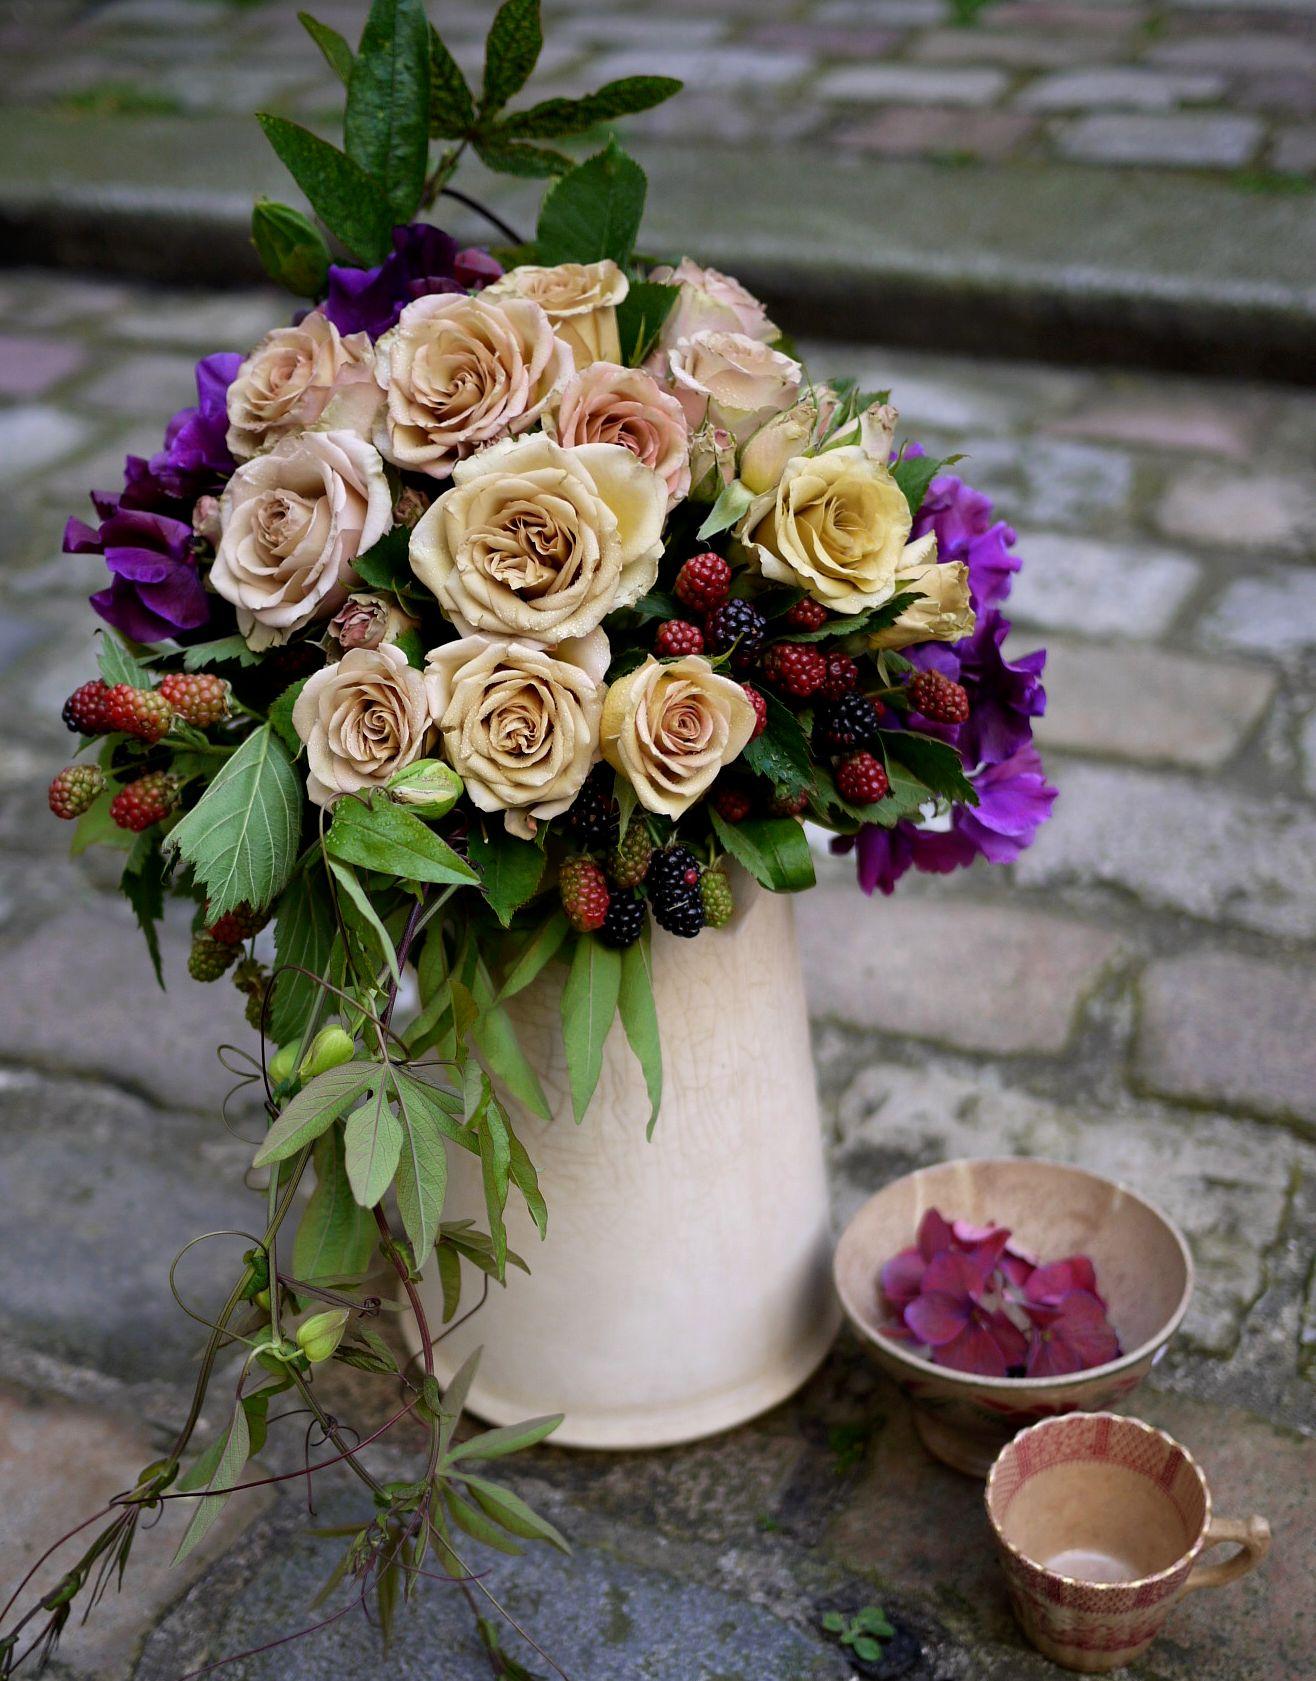 rose, pois de senteur, hortensia, mure,